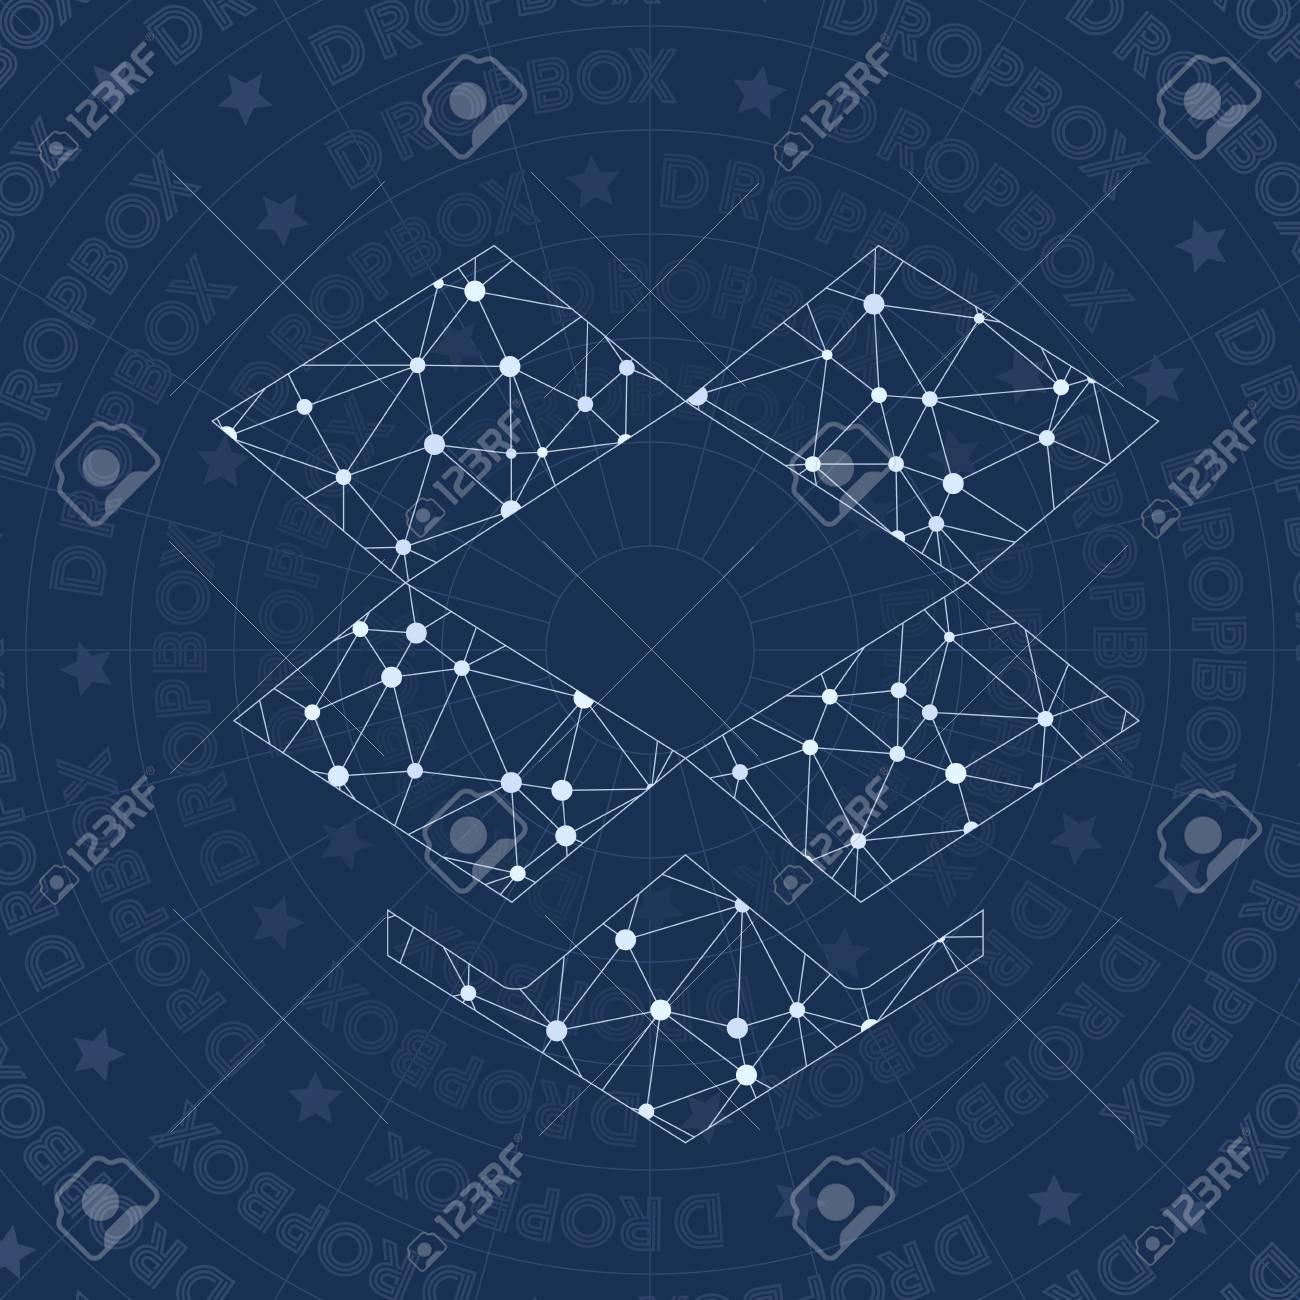 Dropbox Network Symbol Alive Constellation Style Symbol Royalty